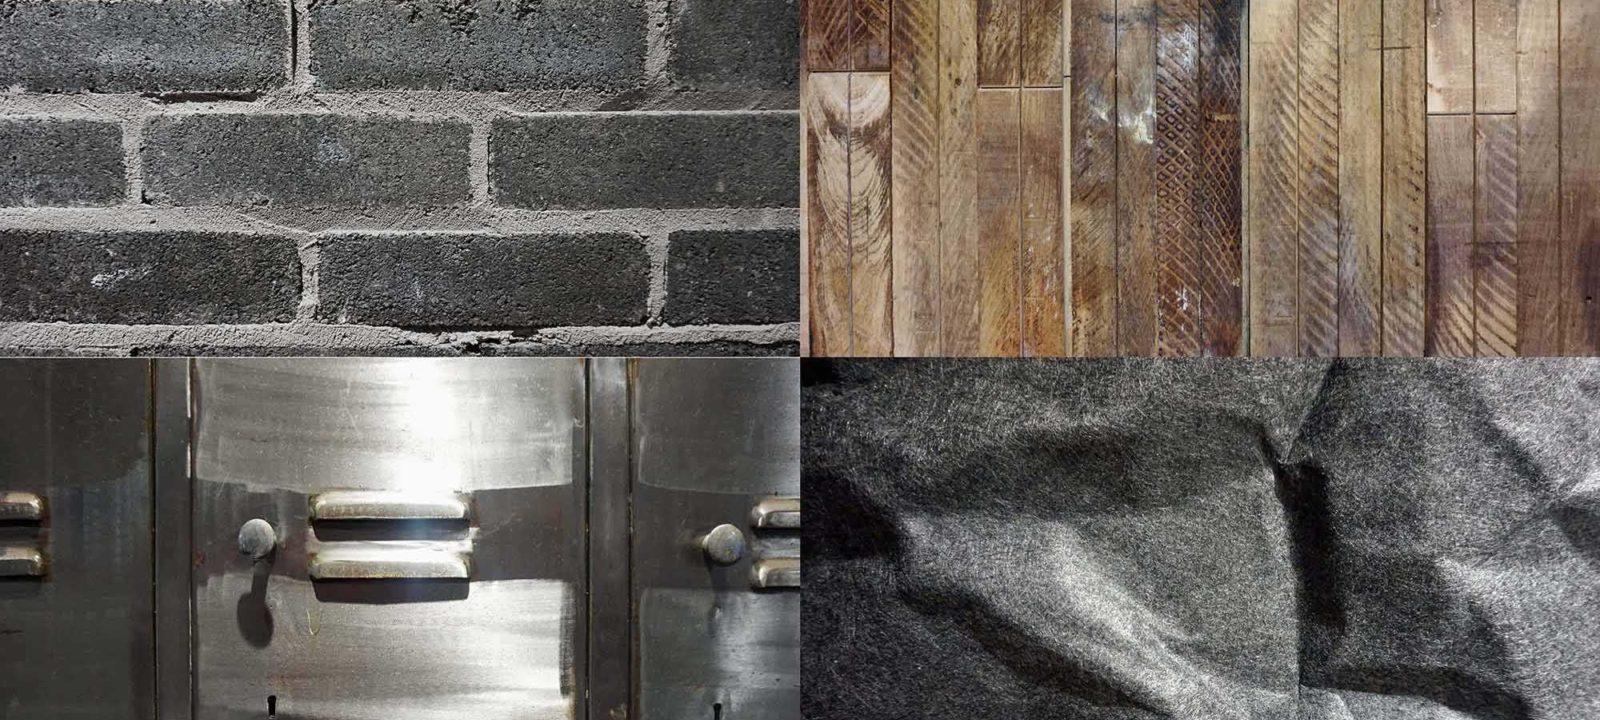 tinto-collage_2020-10-07-084523.jpg